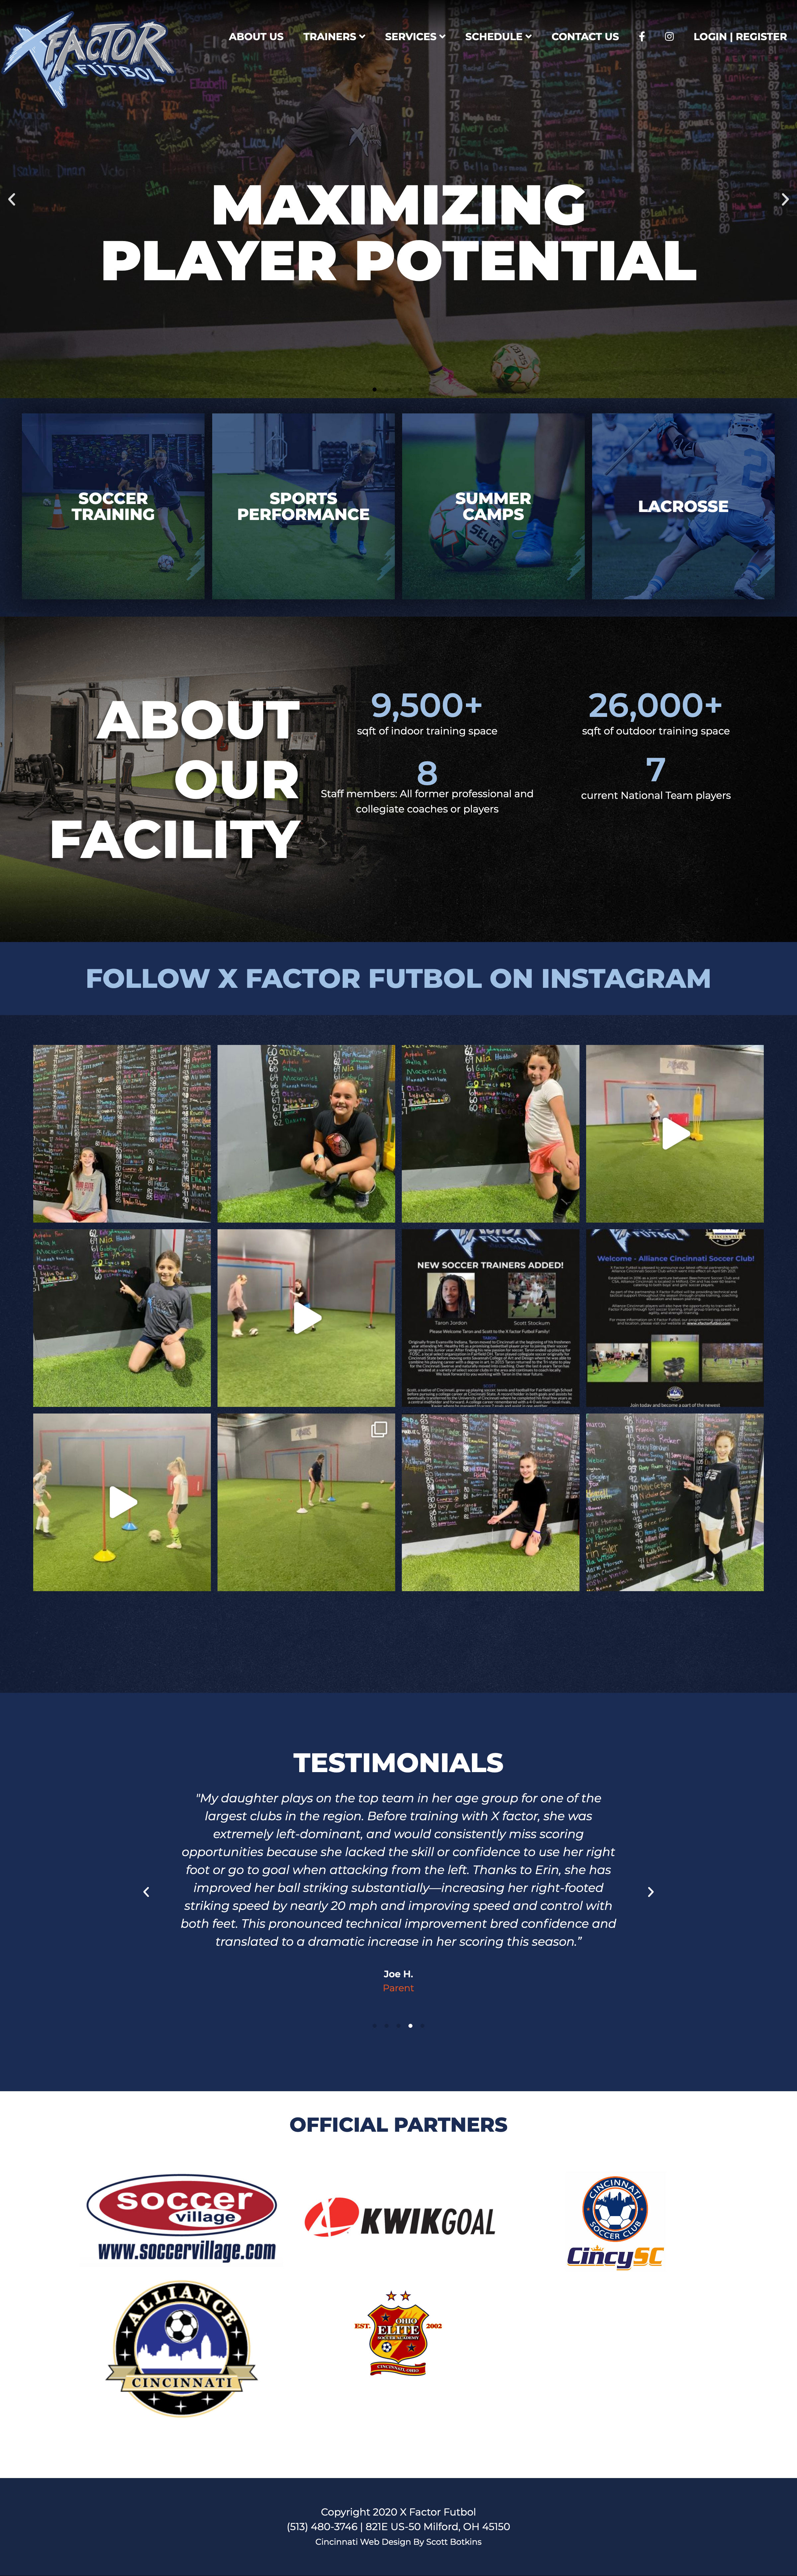 XFactor Futbol